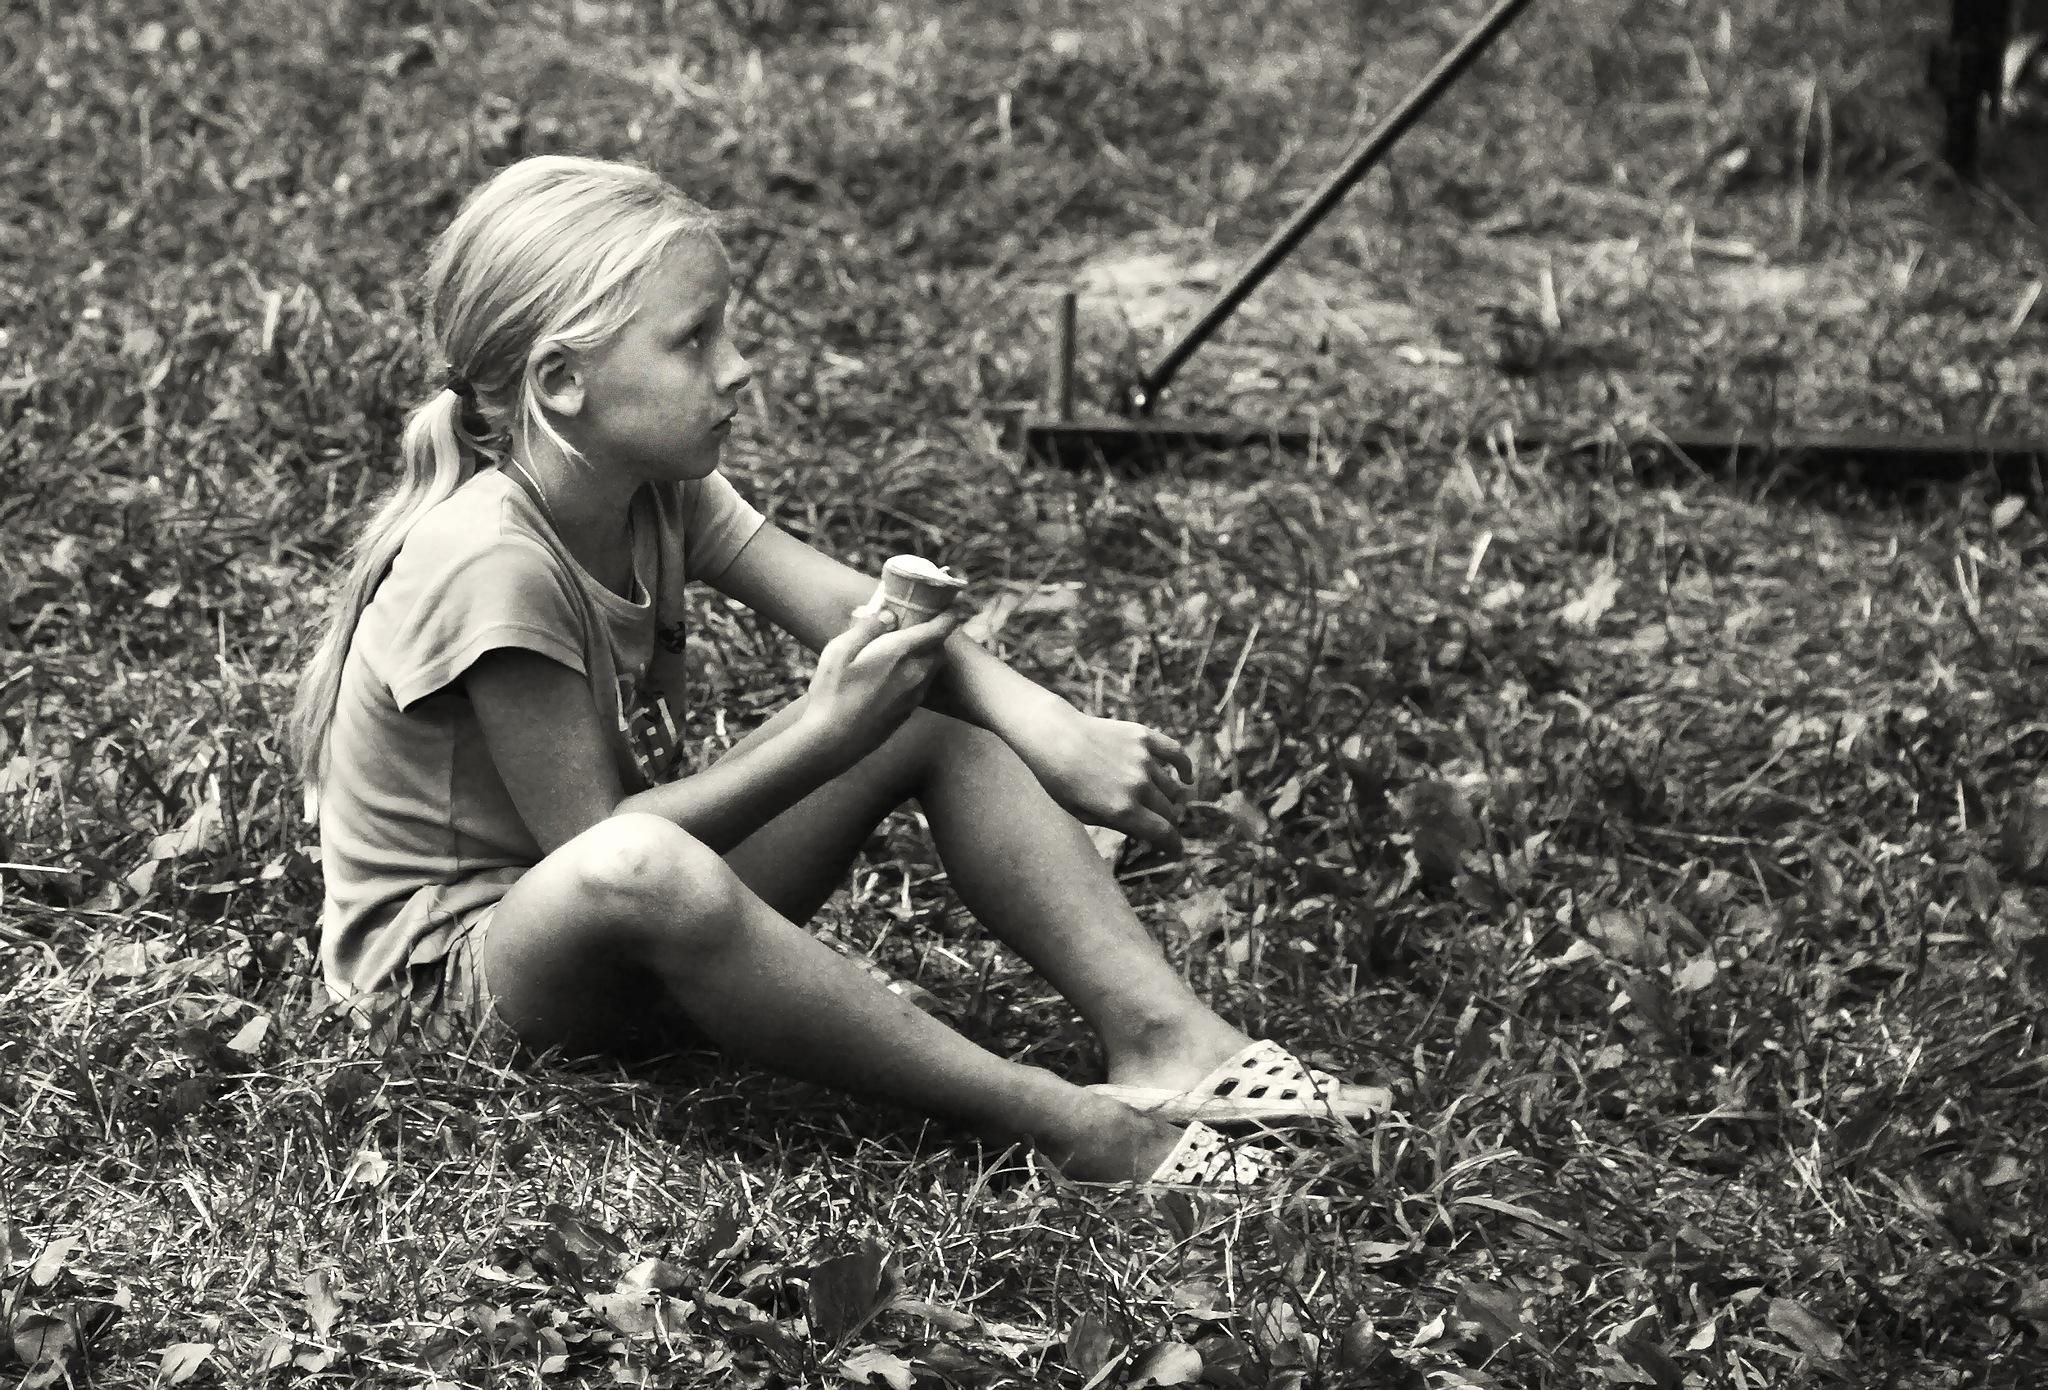 Girl and ice cream by Сергей Юрьев